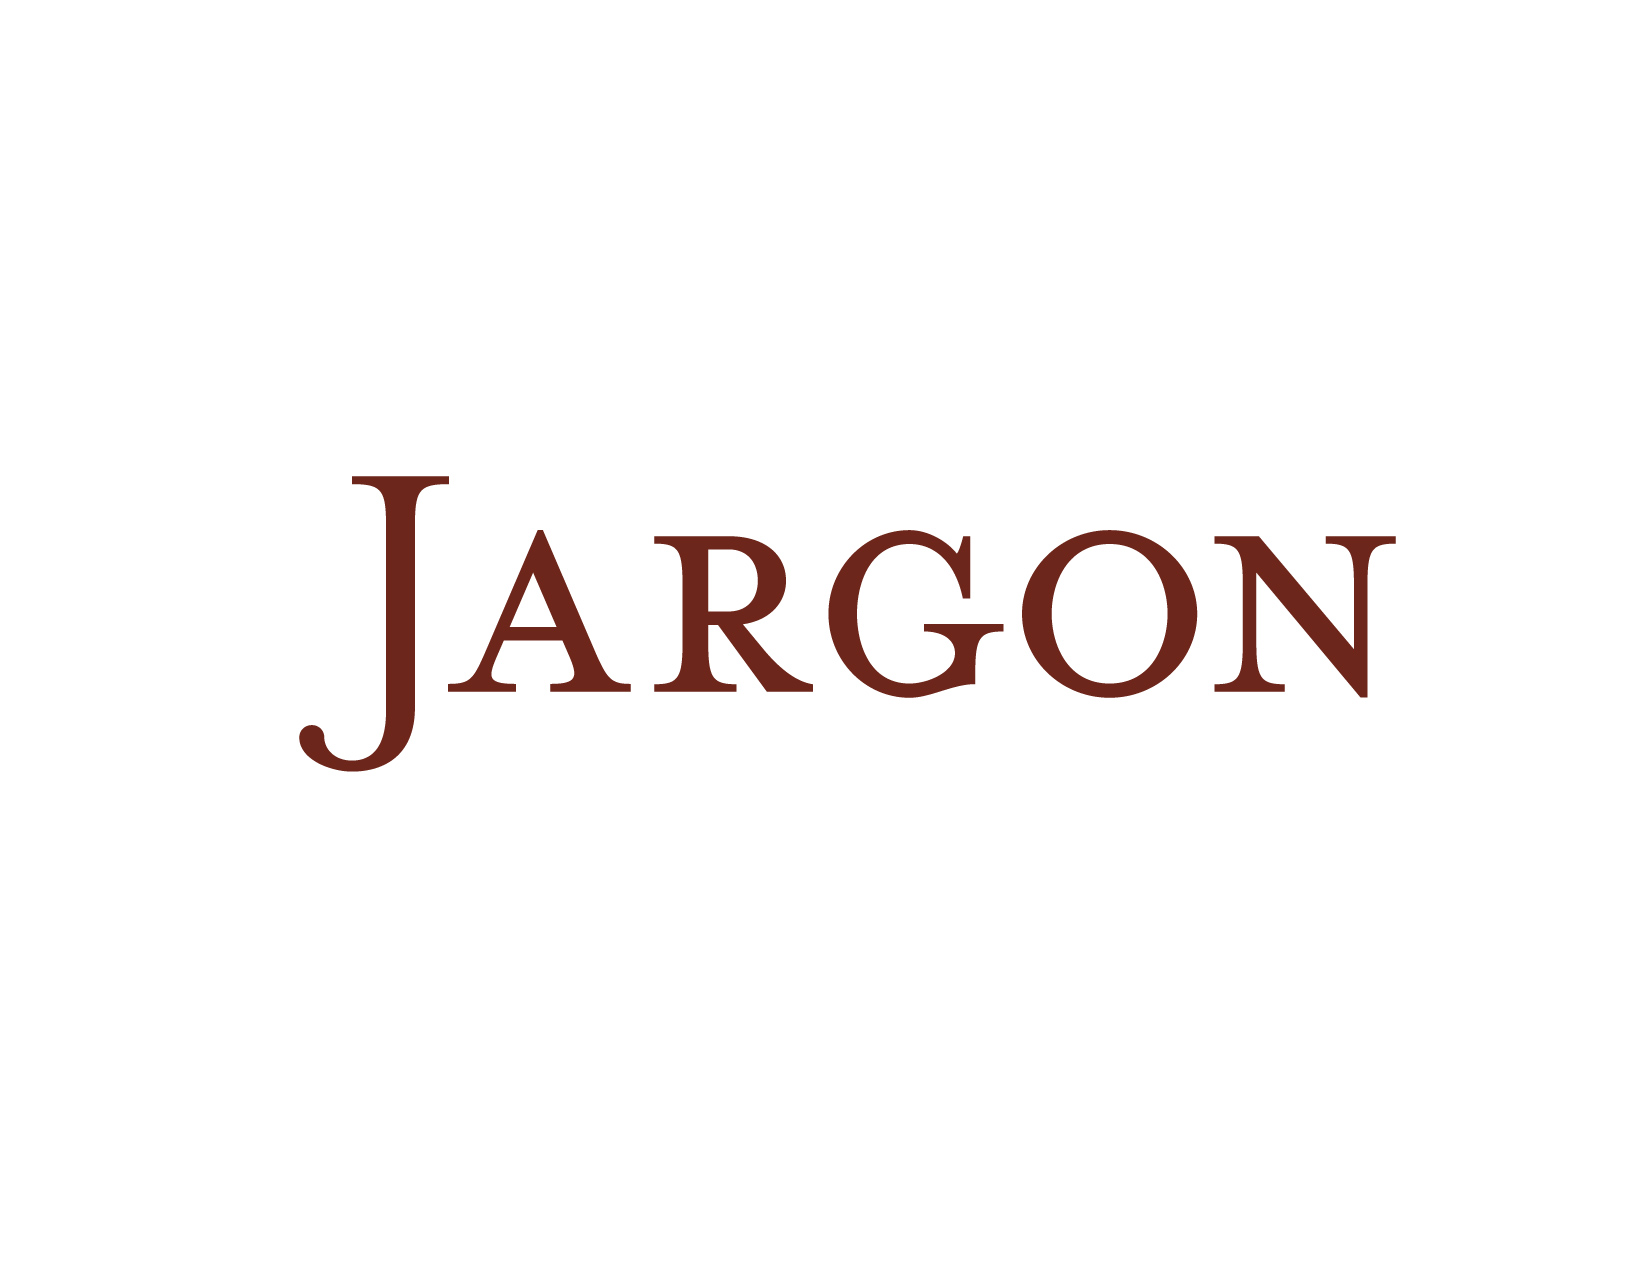 jargon-01.jpg